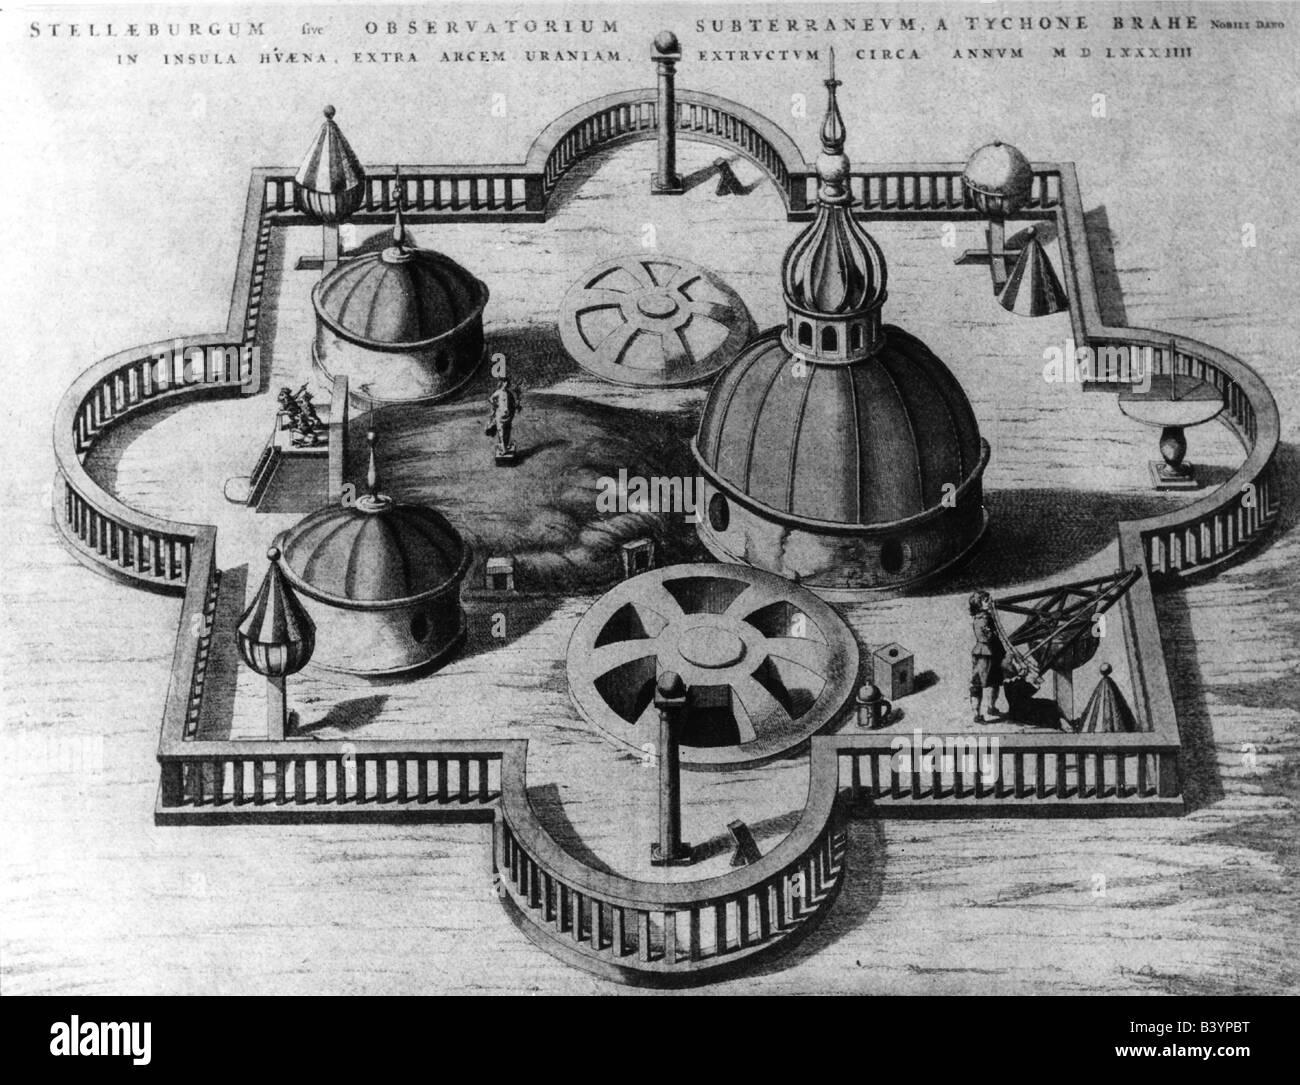 Brahe, Tycho, 14.12.1546 - 24.10.1601, Danish astronomer, observatory Sternburg island Hveen 1584, , Additional - Stock Image